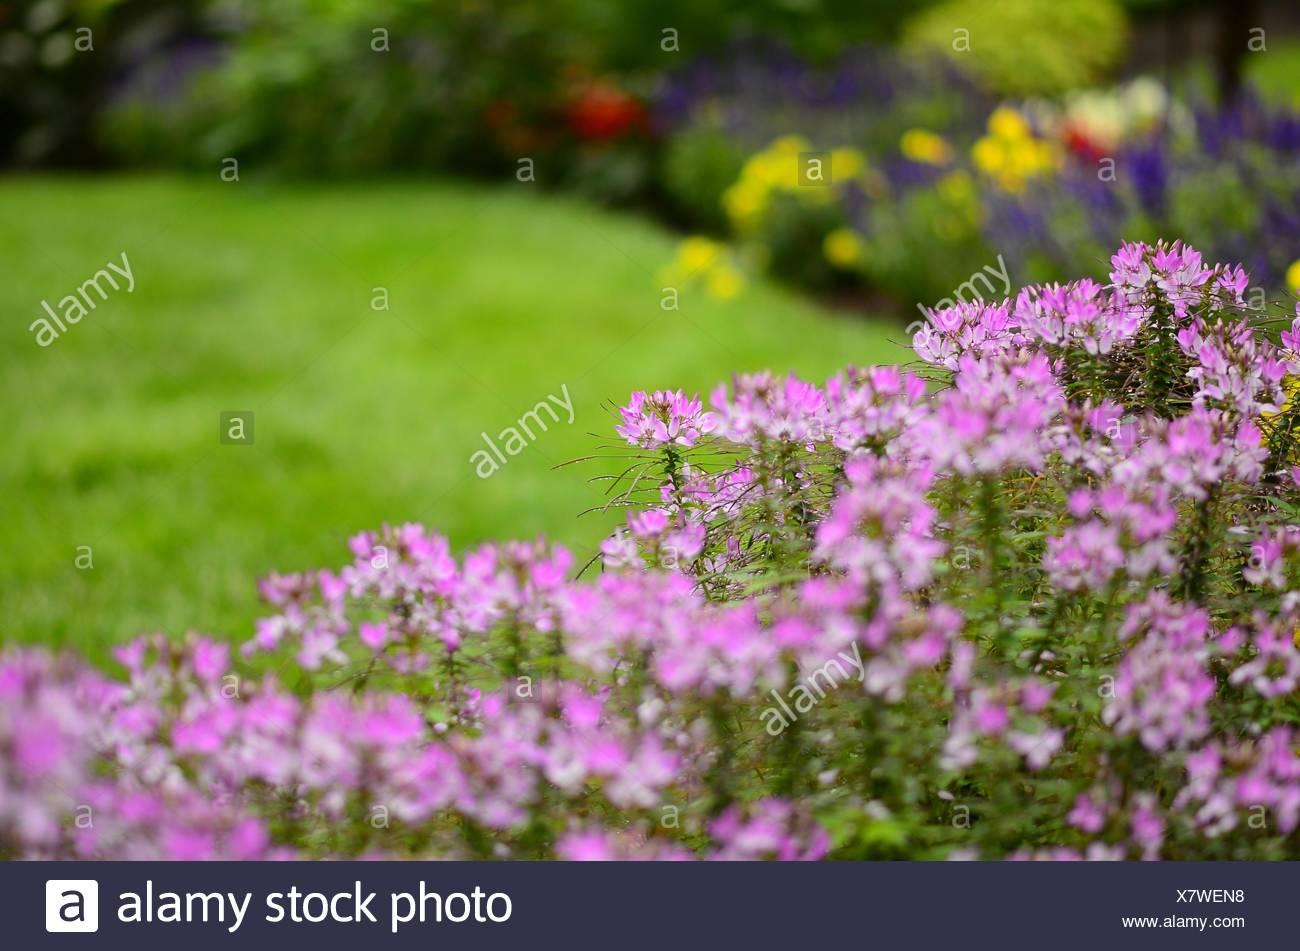 Cleome flowers in very soft focus highlight the flower garden, Pennsylvania, USA. - Stock Image